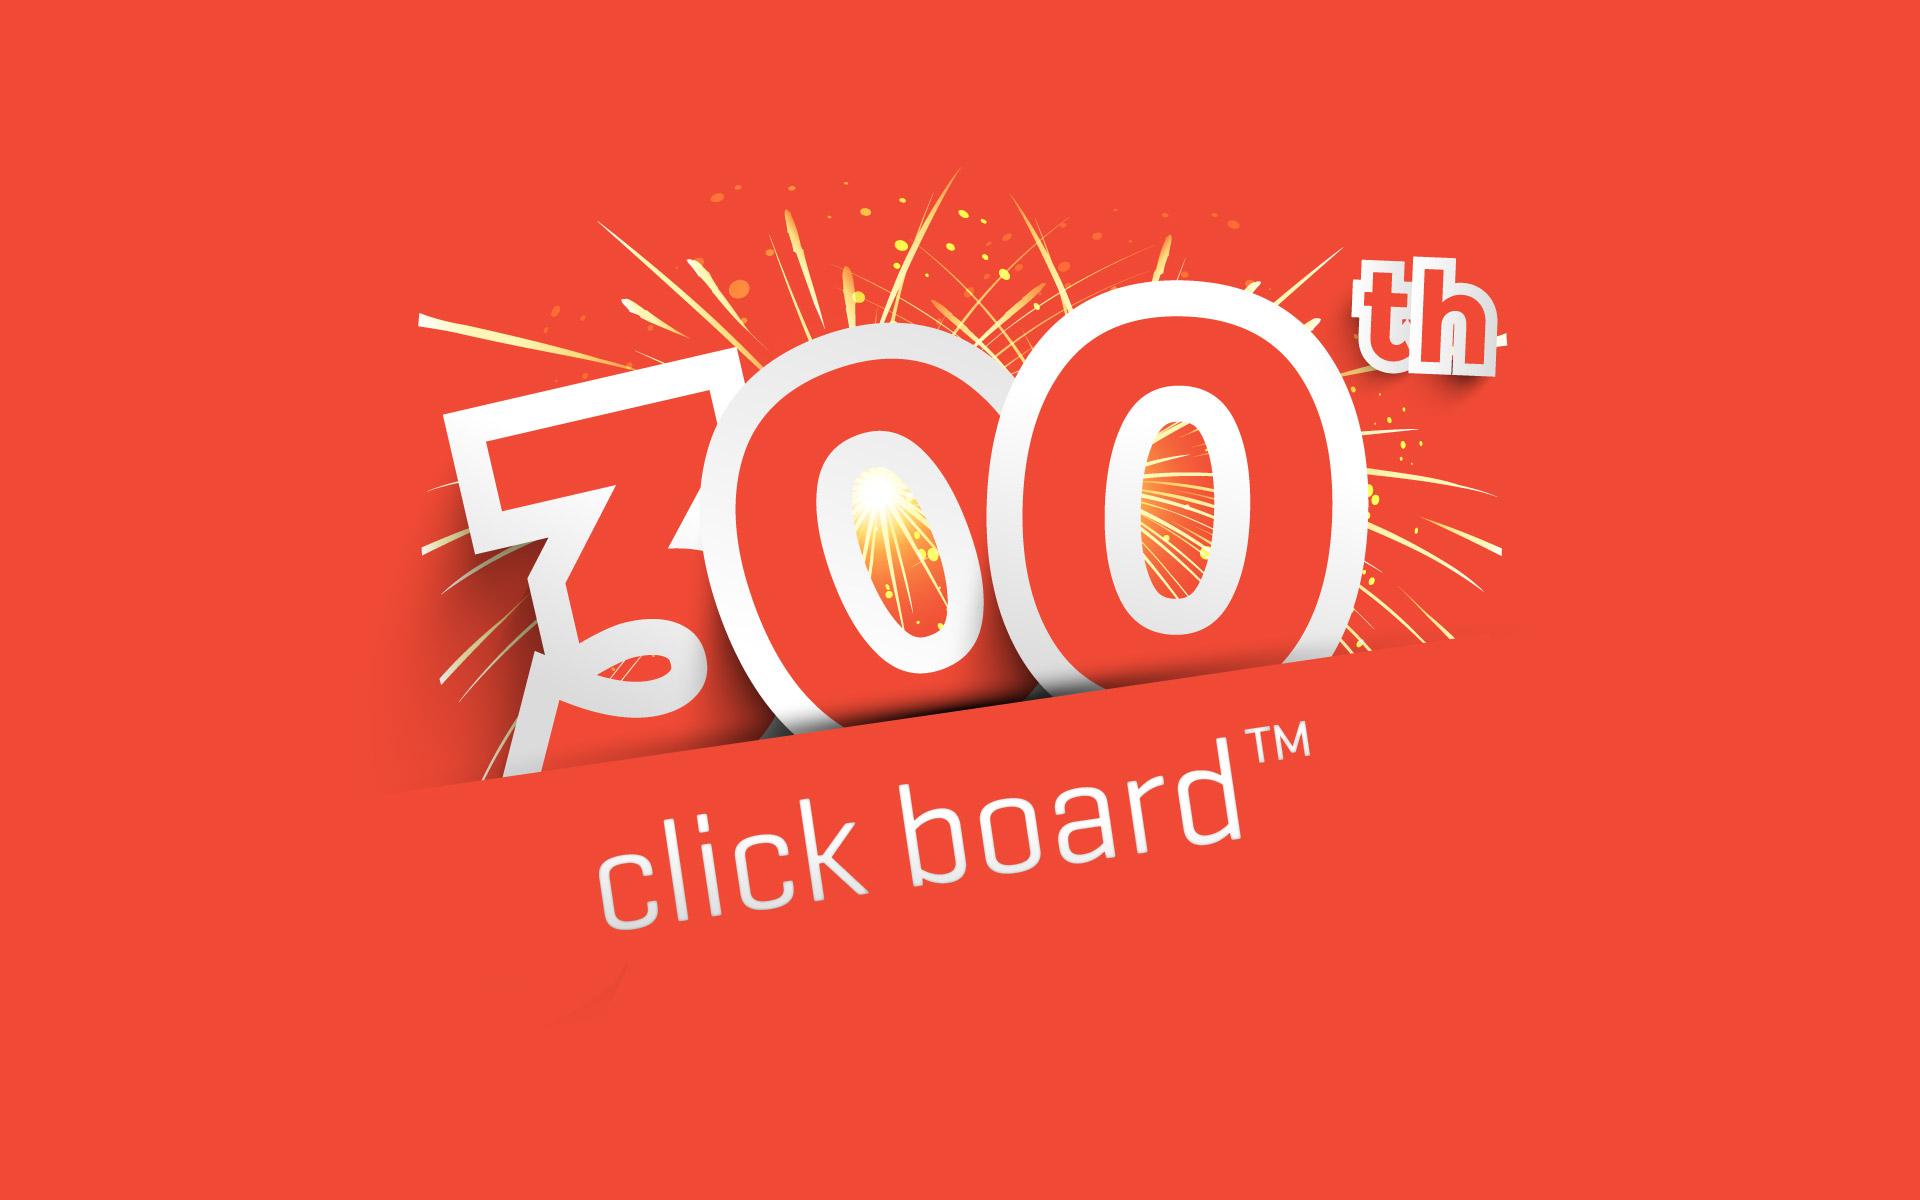 A peak into the 300th click board™ party